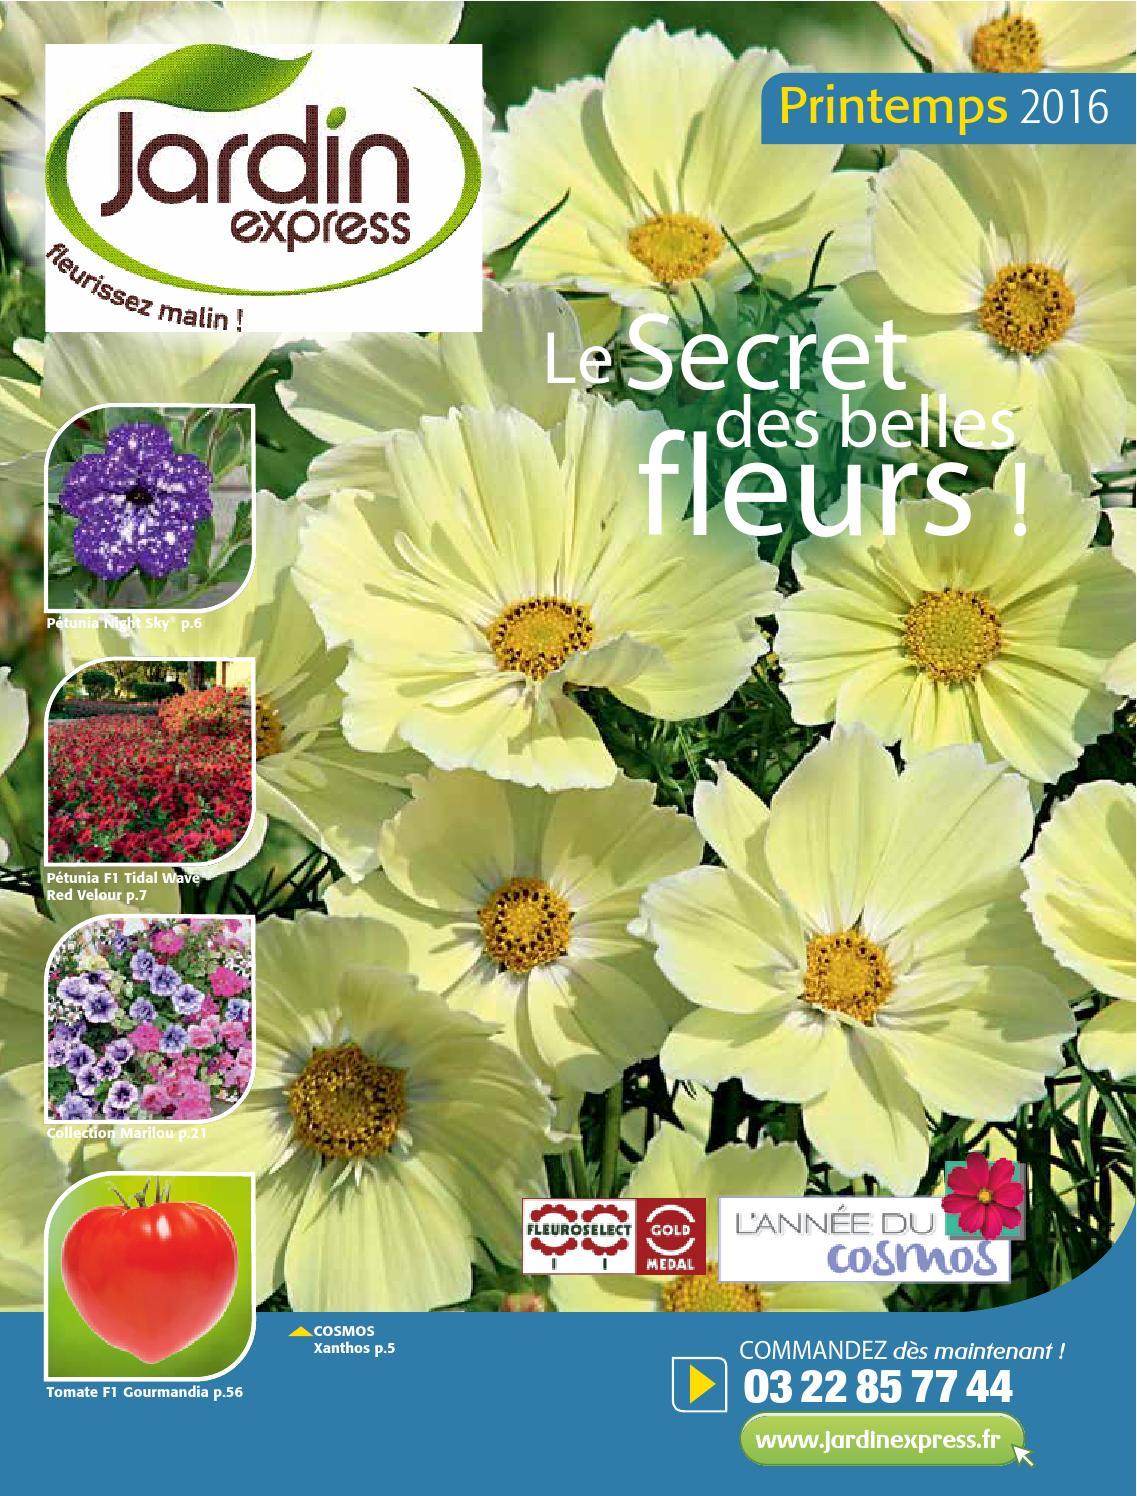 Jardin Express : collection Printemps 2016 by Jardin ...